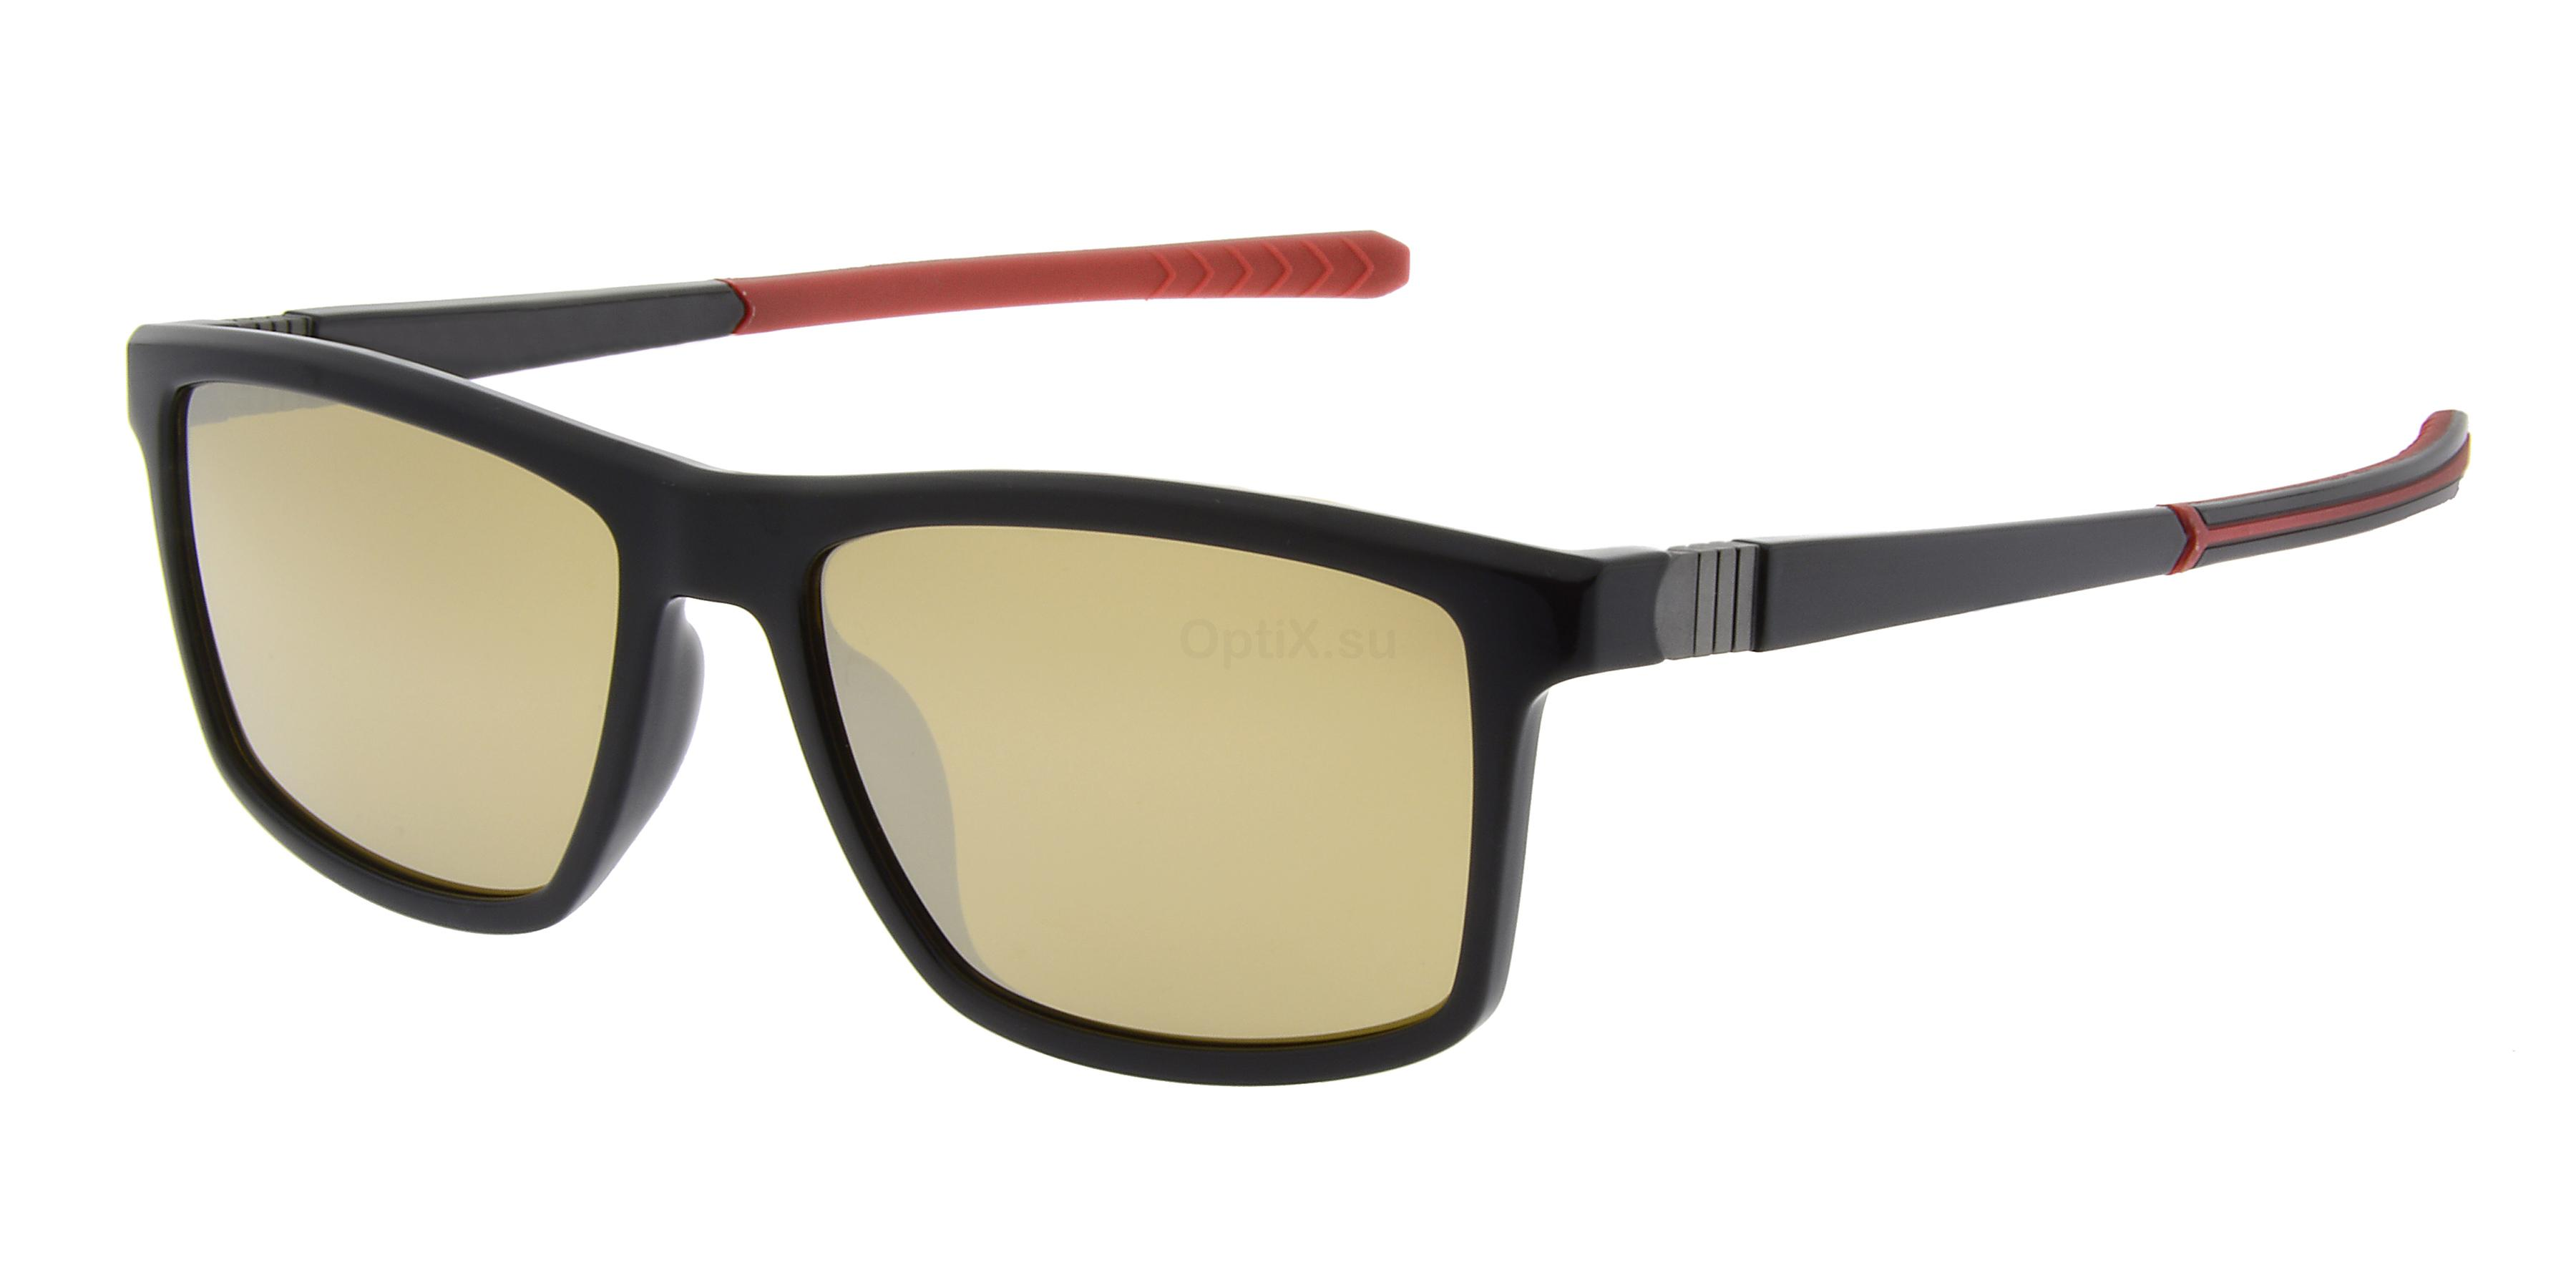 001P SP3012 Sunglasses, Spine